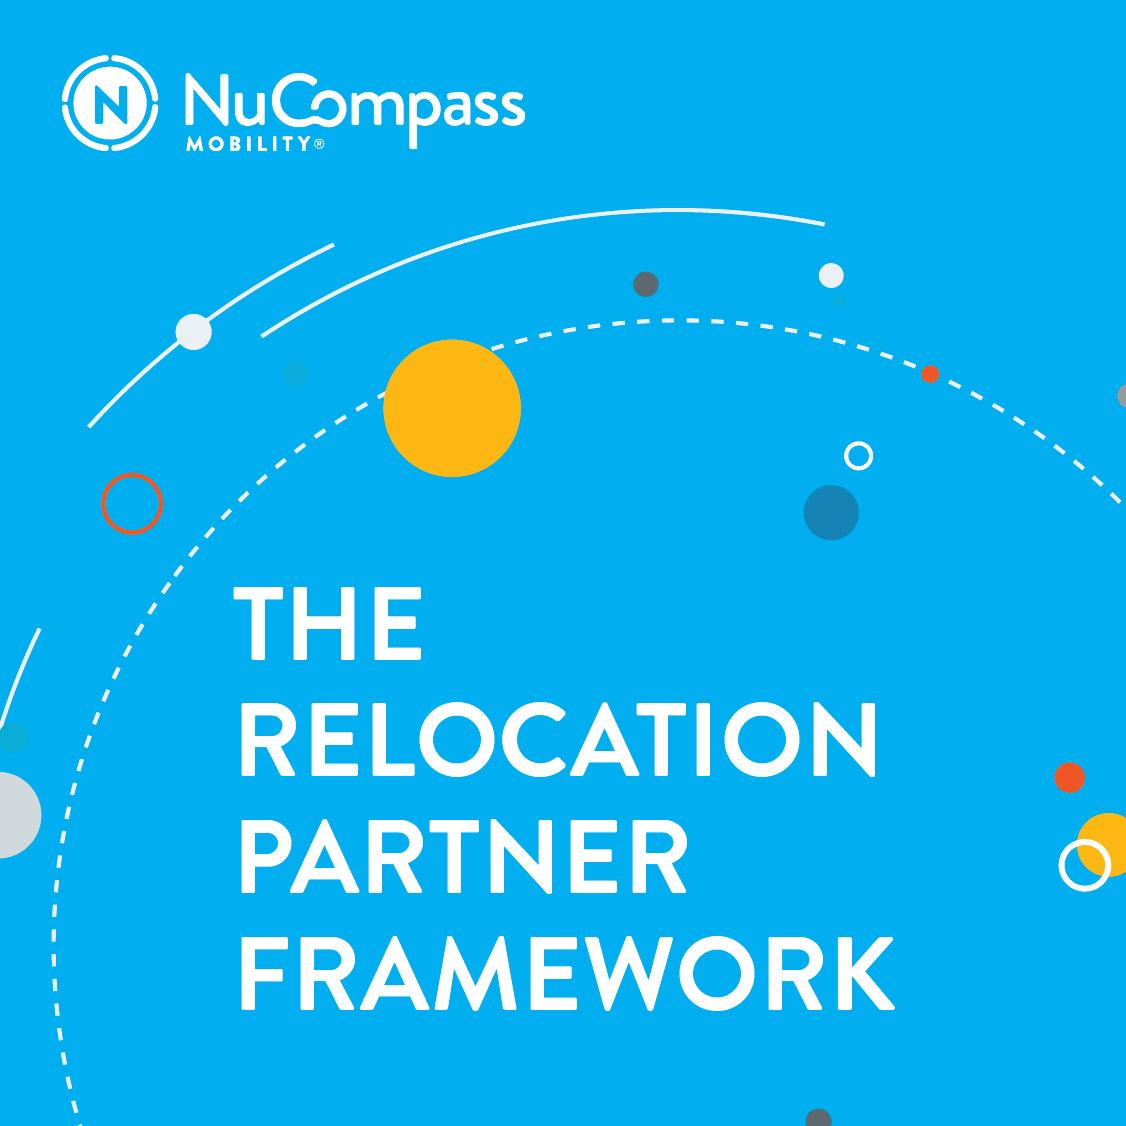 The Relocation Partner Framework